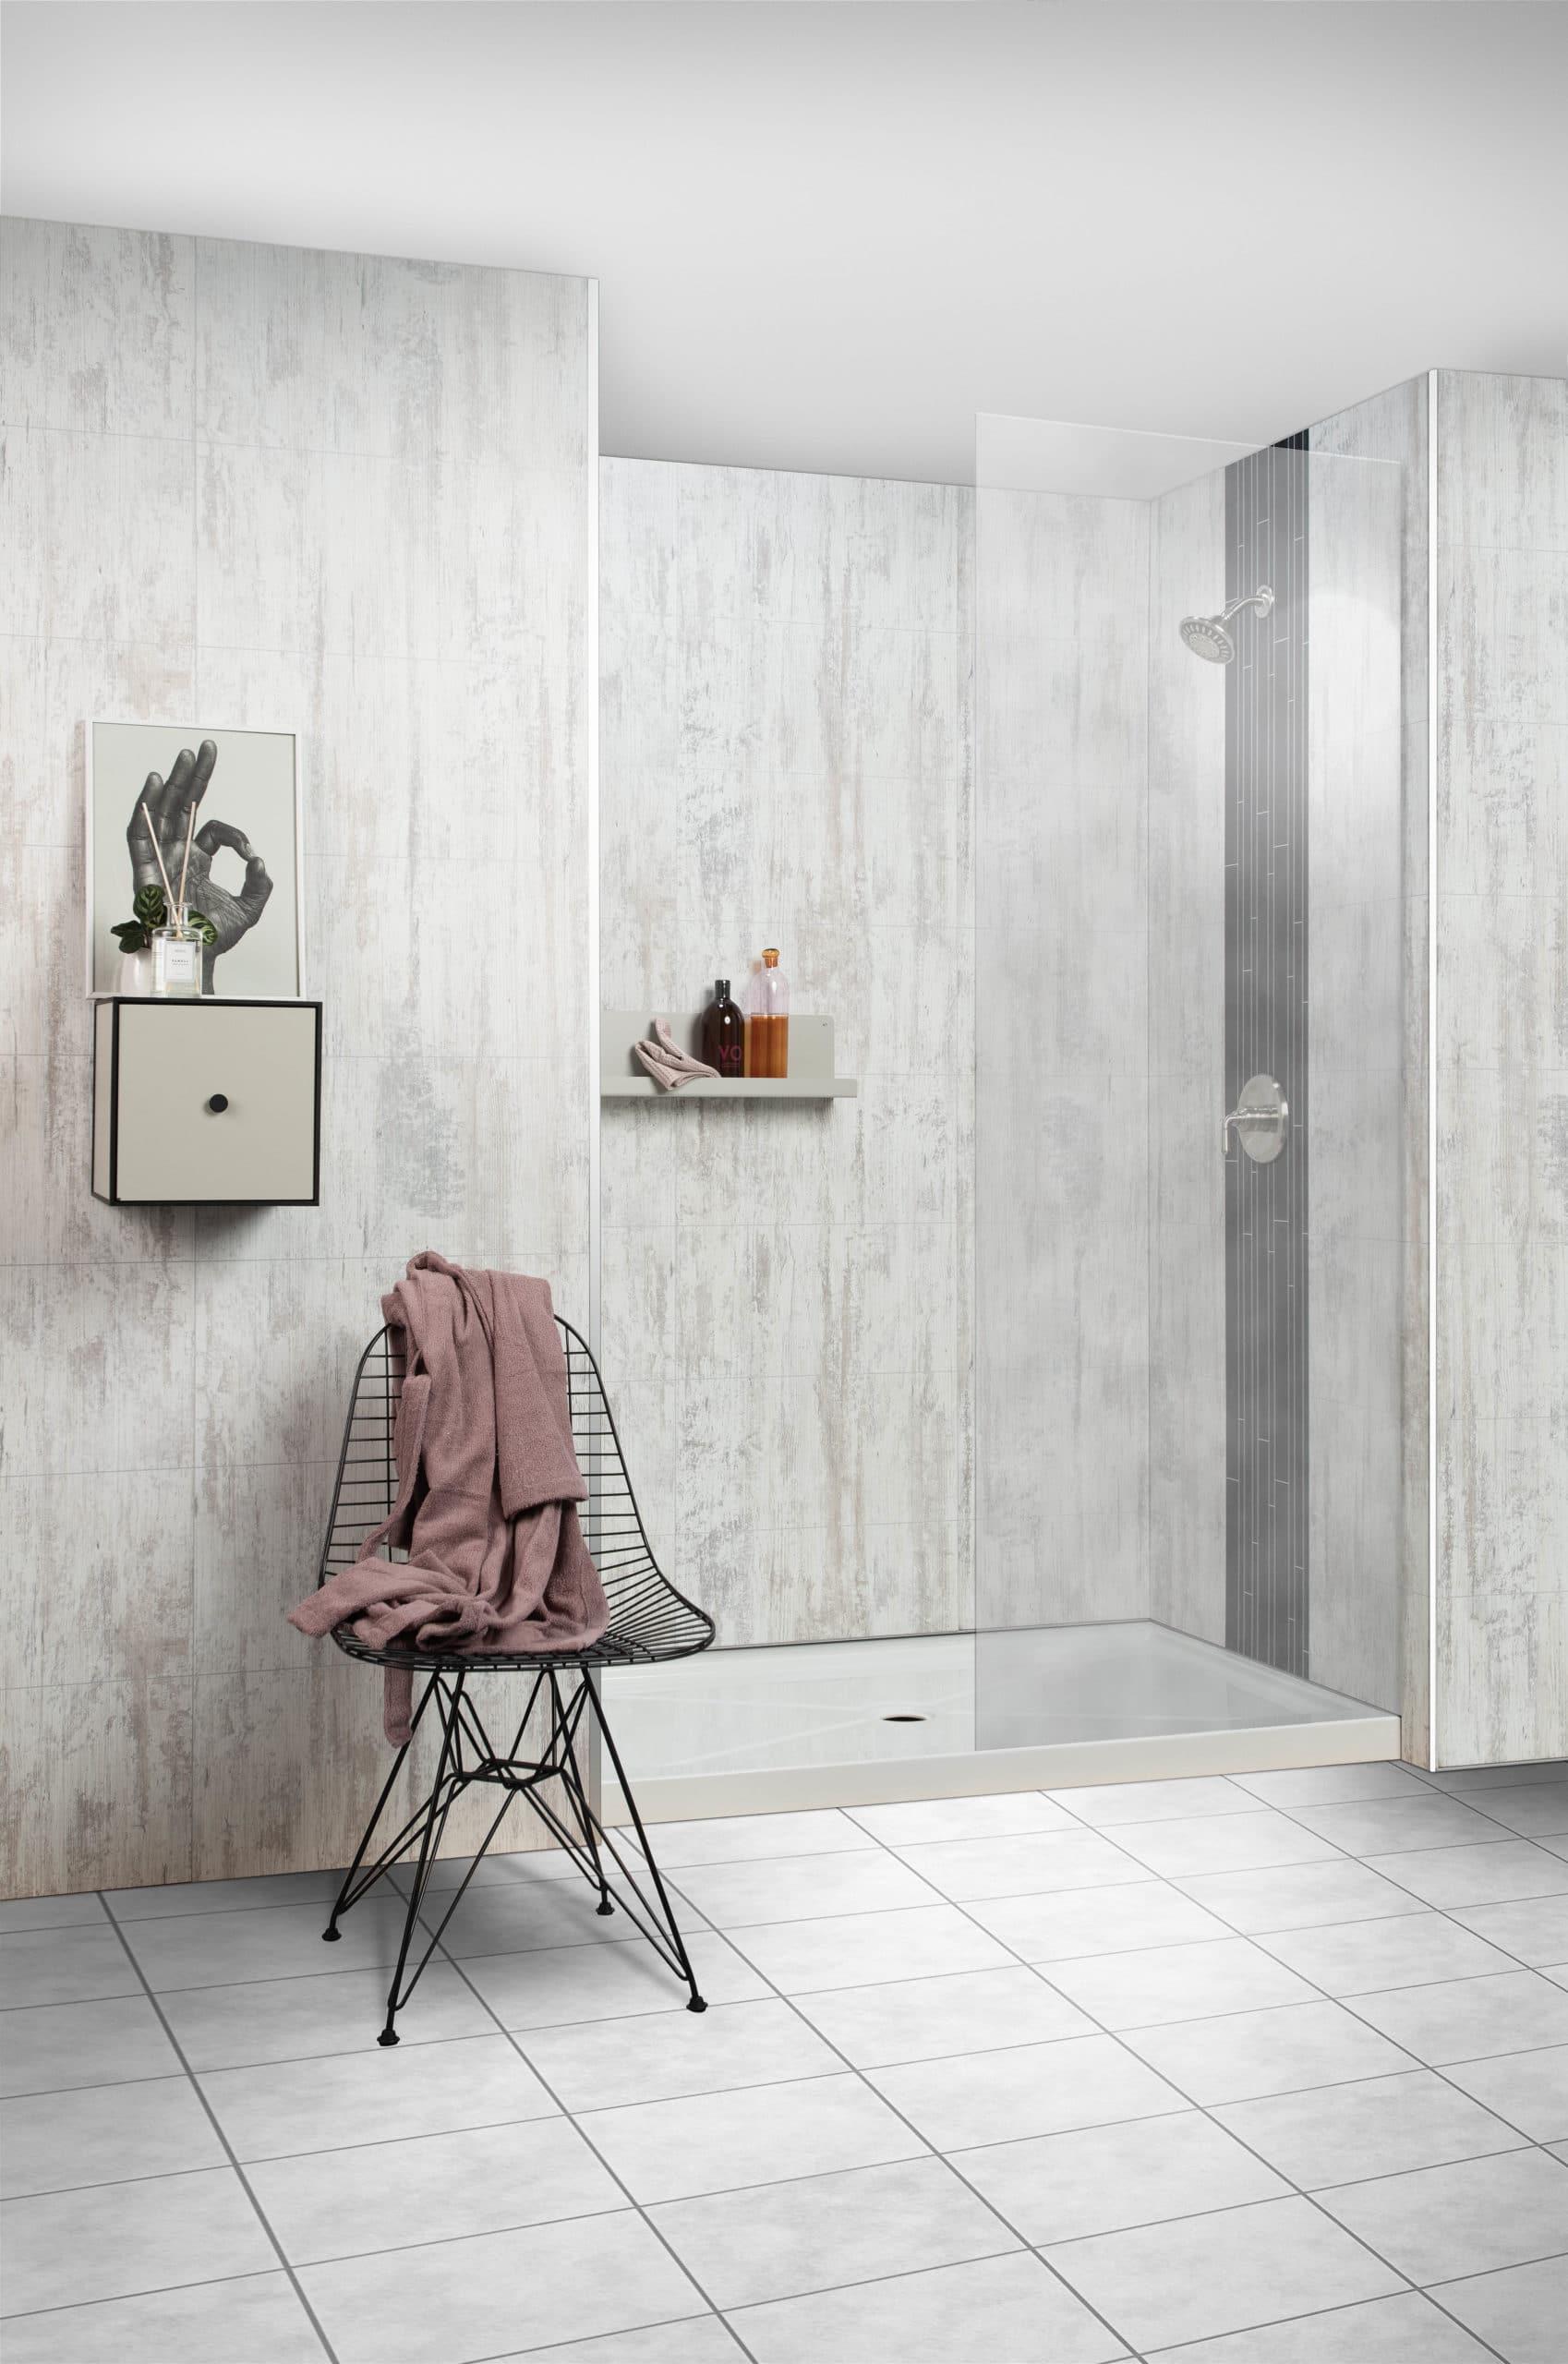 Waterproof Wall Systems And Bathroom Panels, Waterproof Paneling For Bathrooms